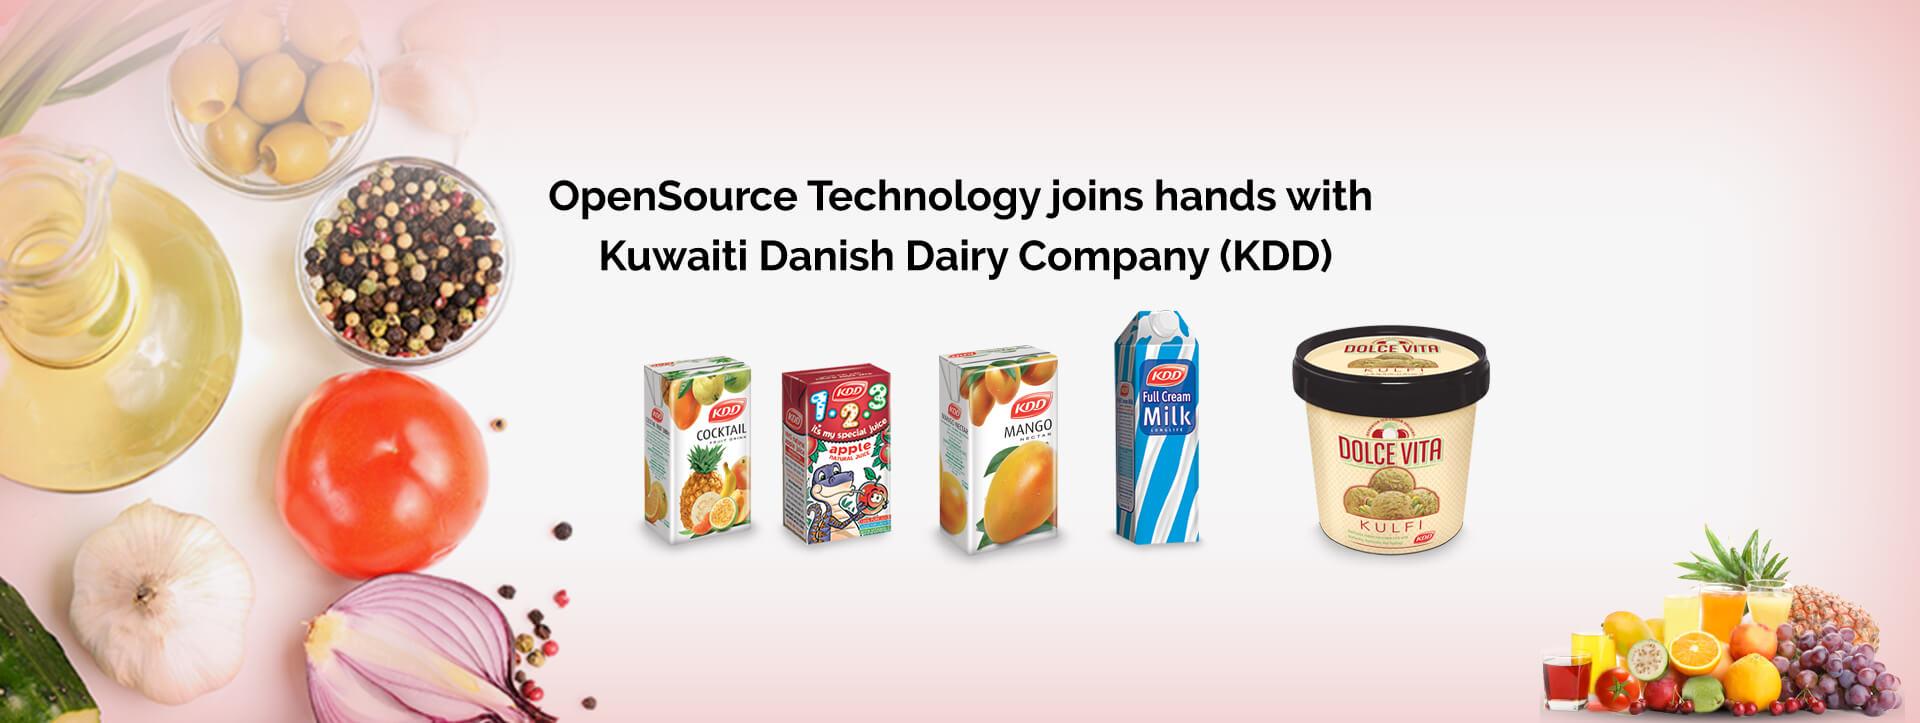 Kuwaiti Danish Dairy | OpenSource Technologies